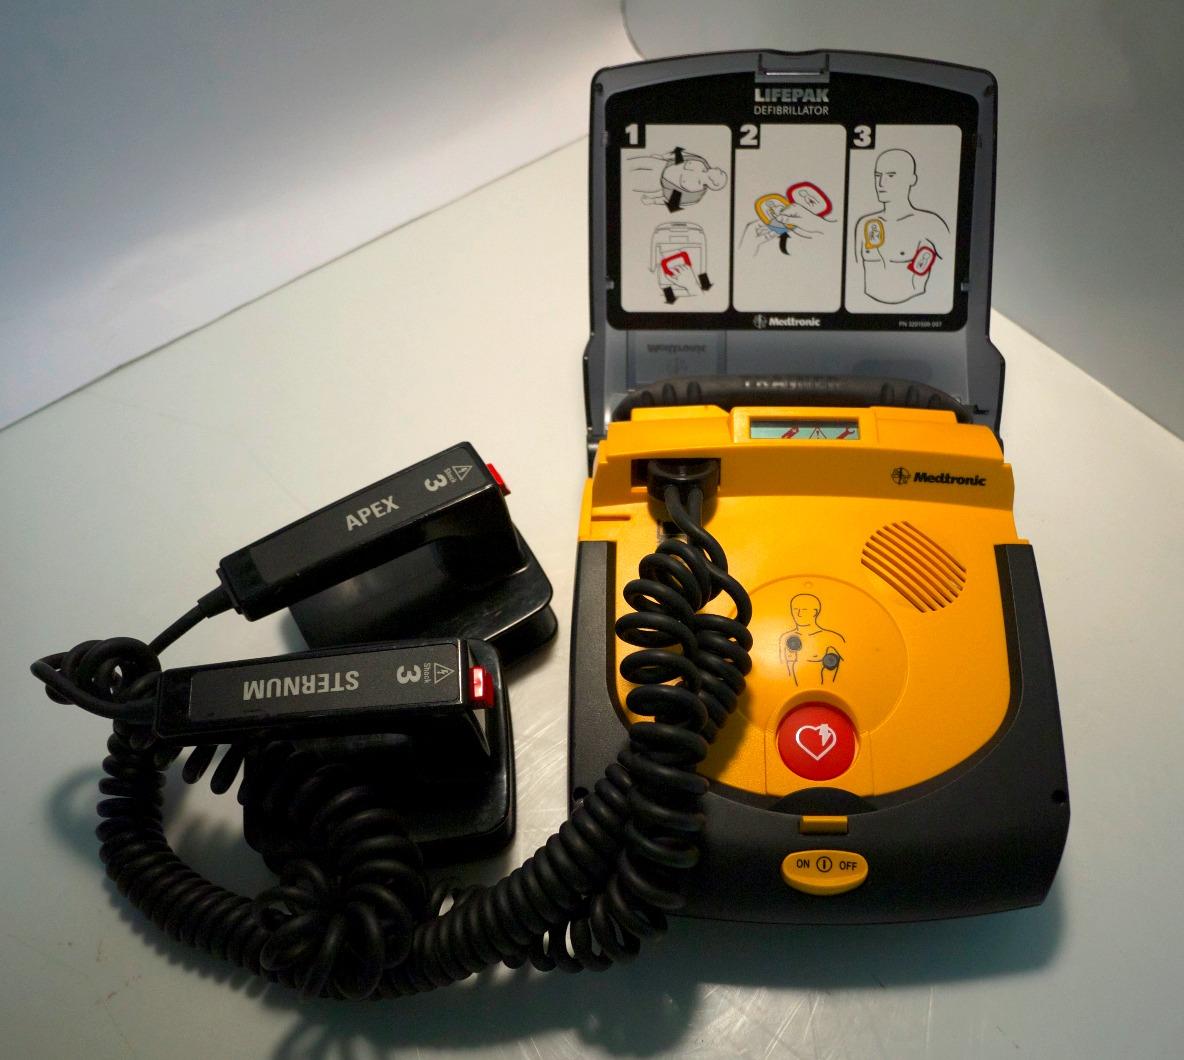 Defibrillator Lifepak